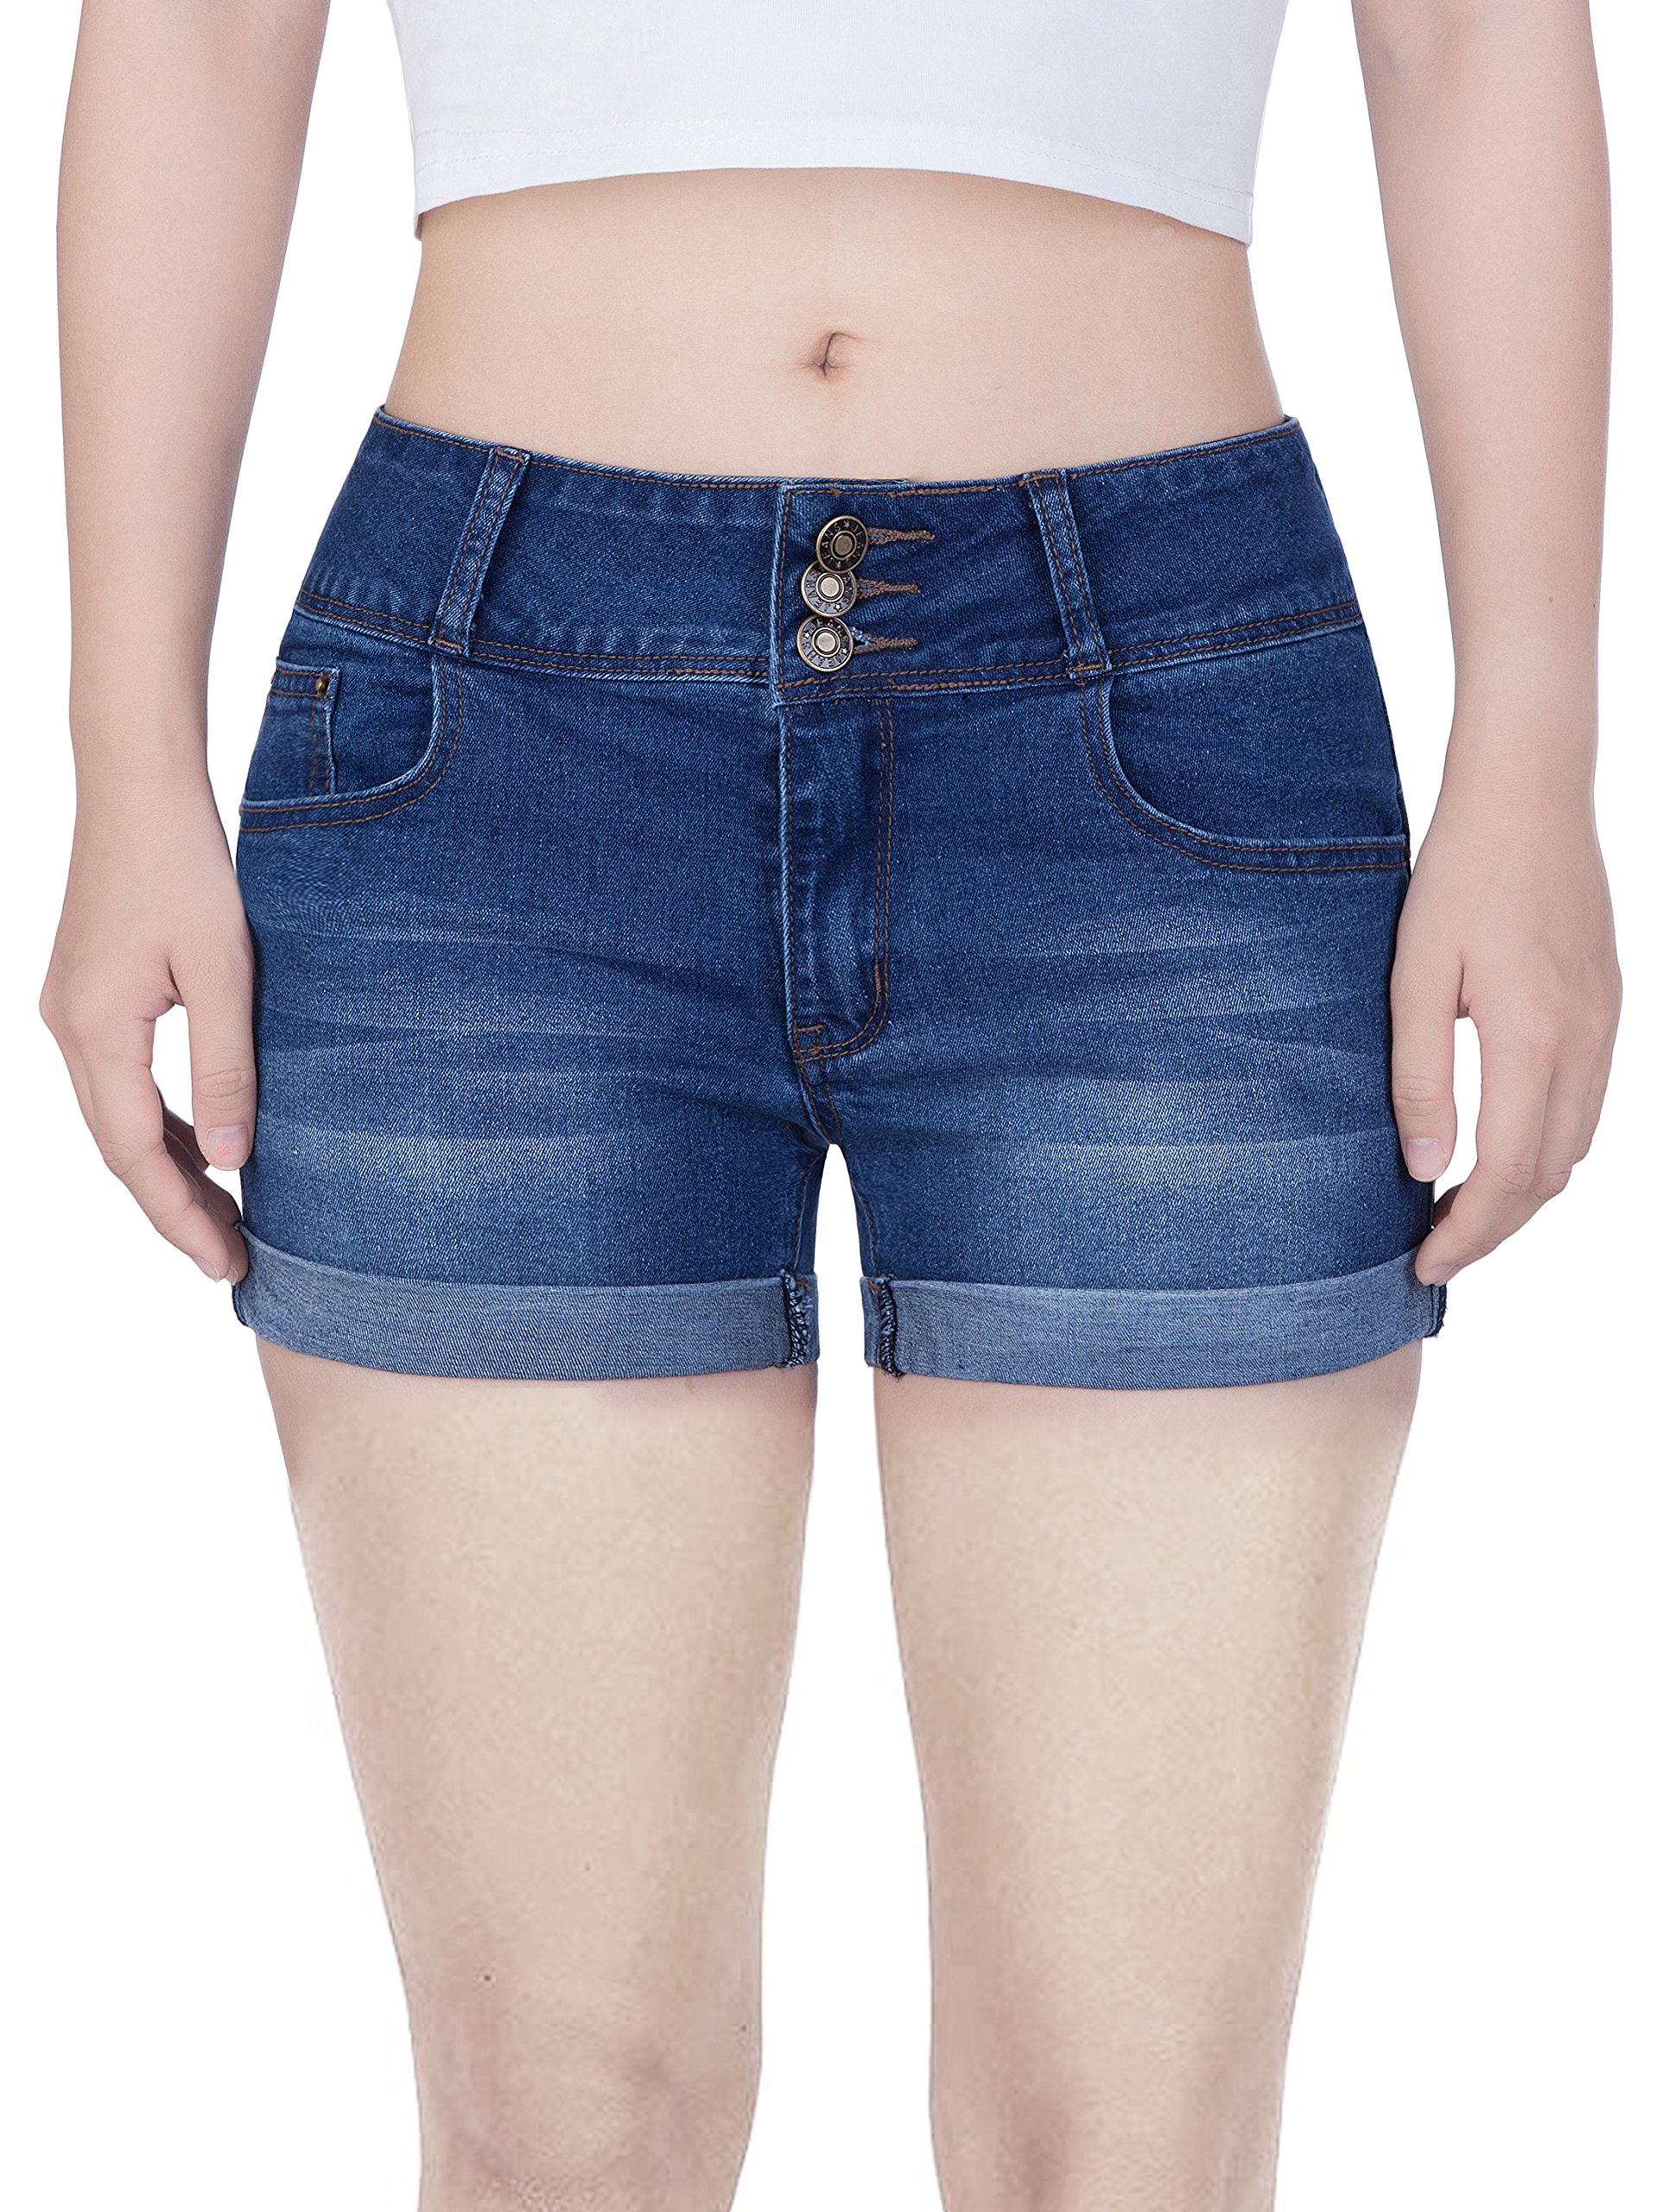 COLINNA Women's Juniors Denim Jean Shorts Mid Thigh Stretch Vintage Folded Hem for Casual